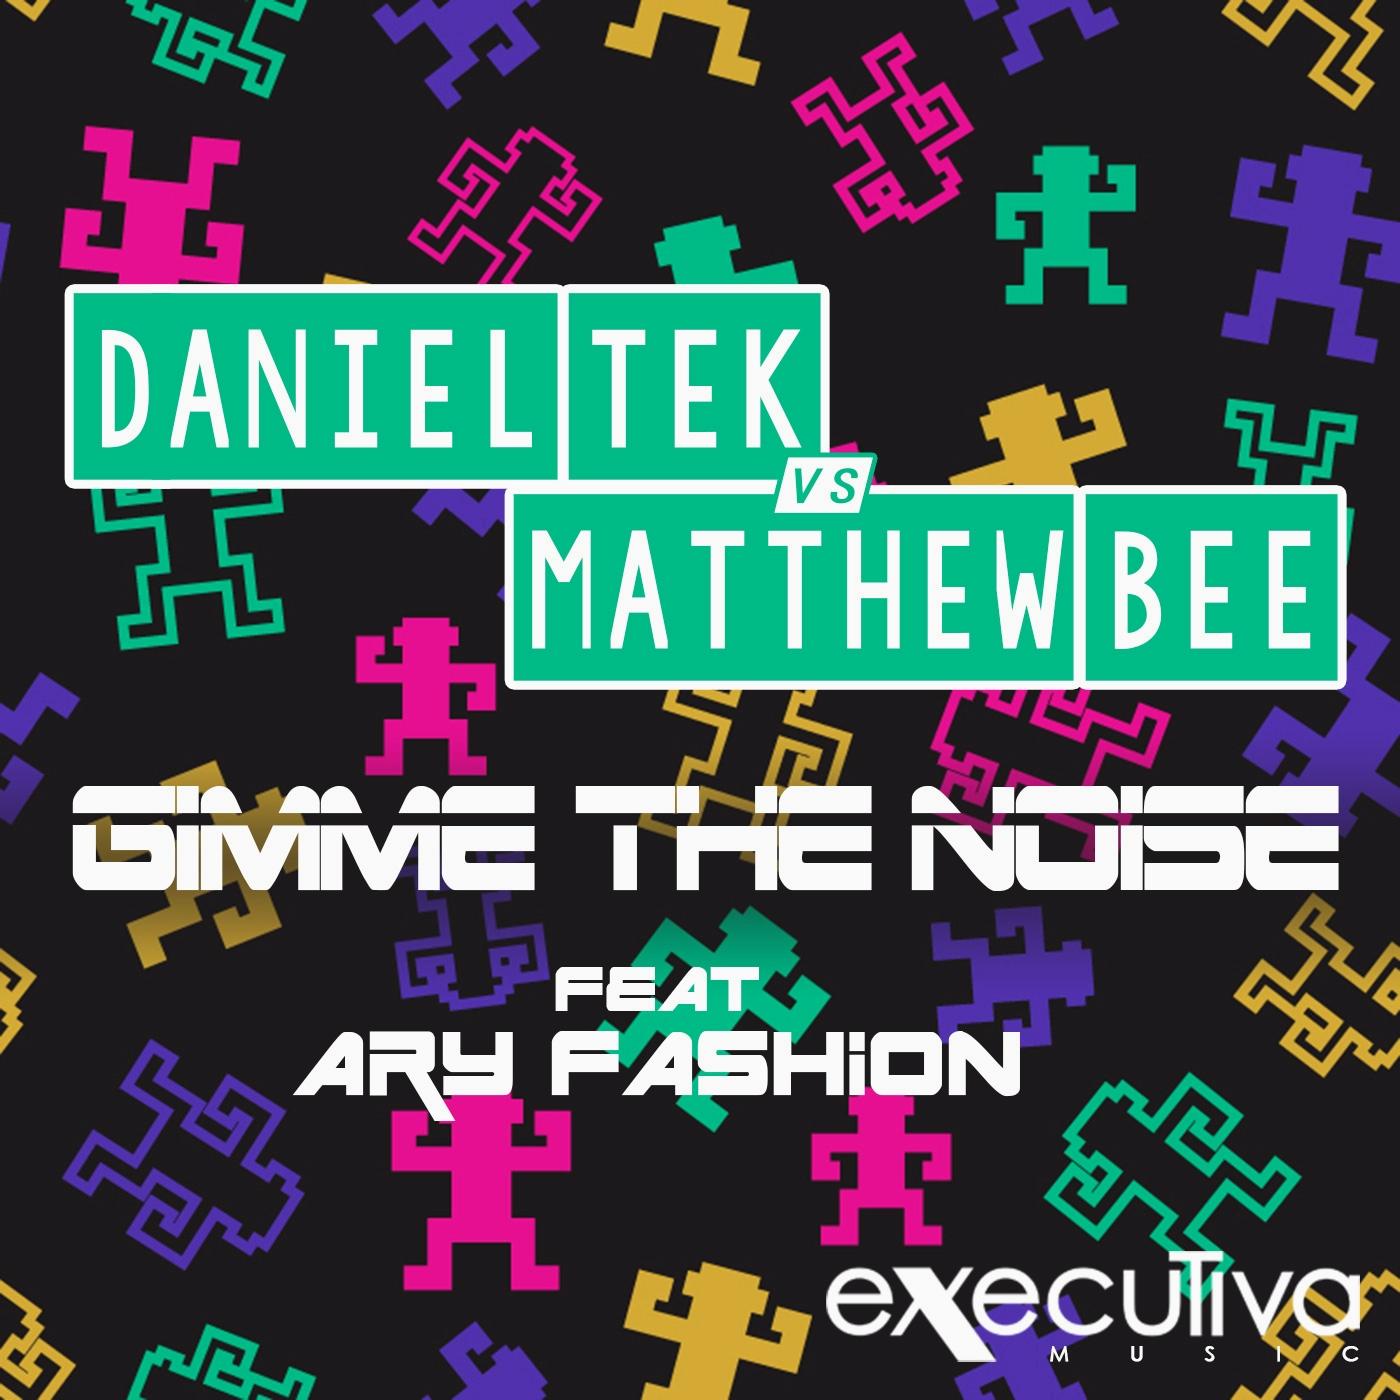 Daniel Tek & Matthew Bee - Gimme The Noise Feat. AryFashion (Rootkey Remix)